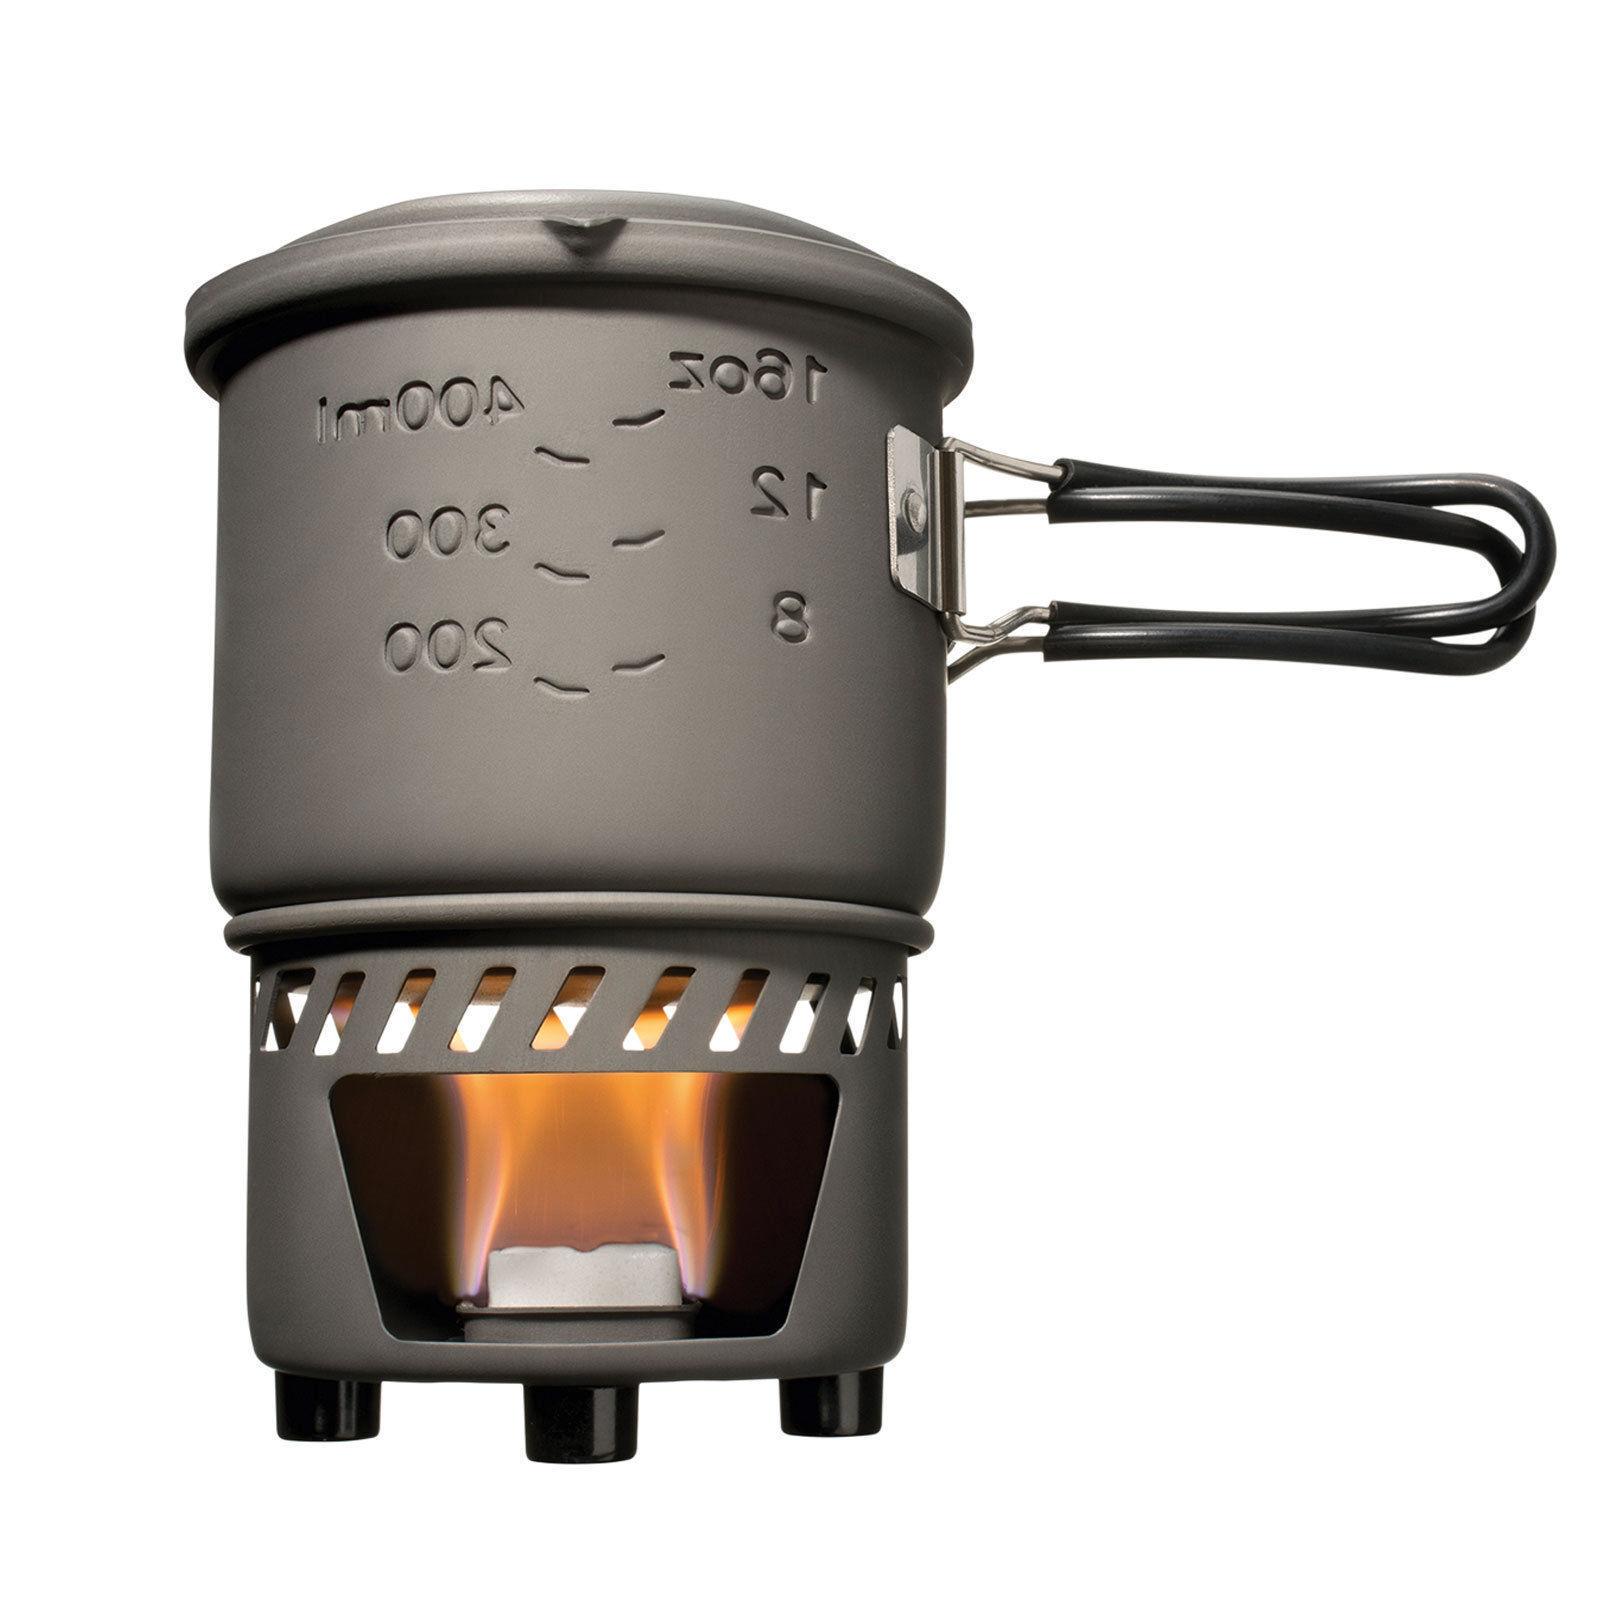 ESBIT Trockenbrennstoff Kochset Mini Campingkocher Trekking Outdoor Kocher Set